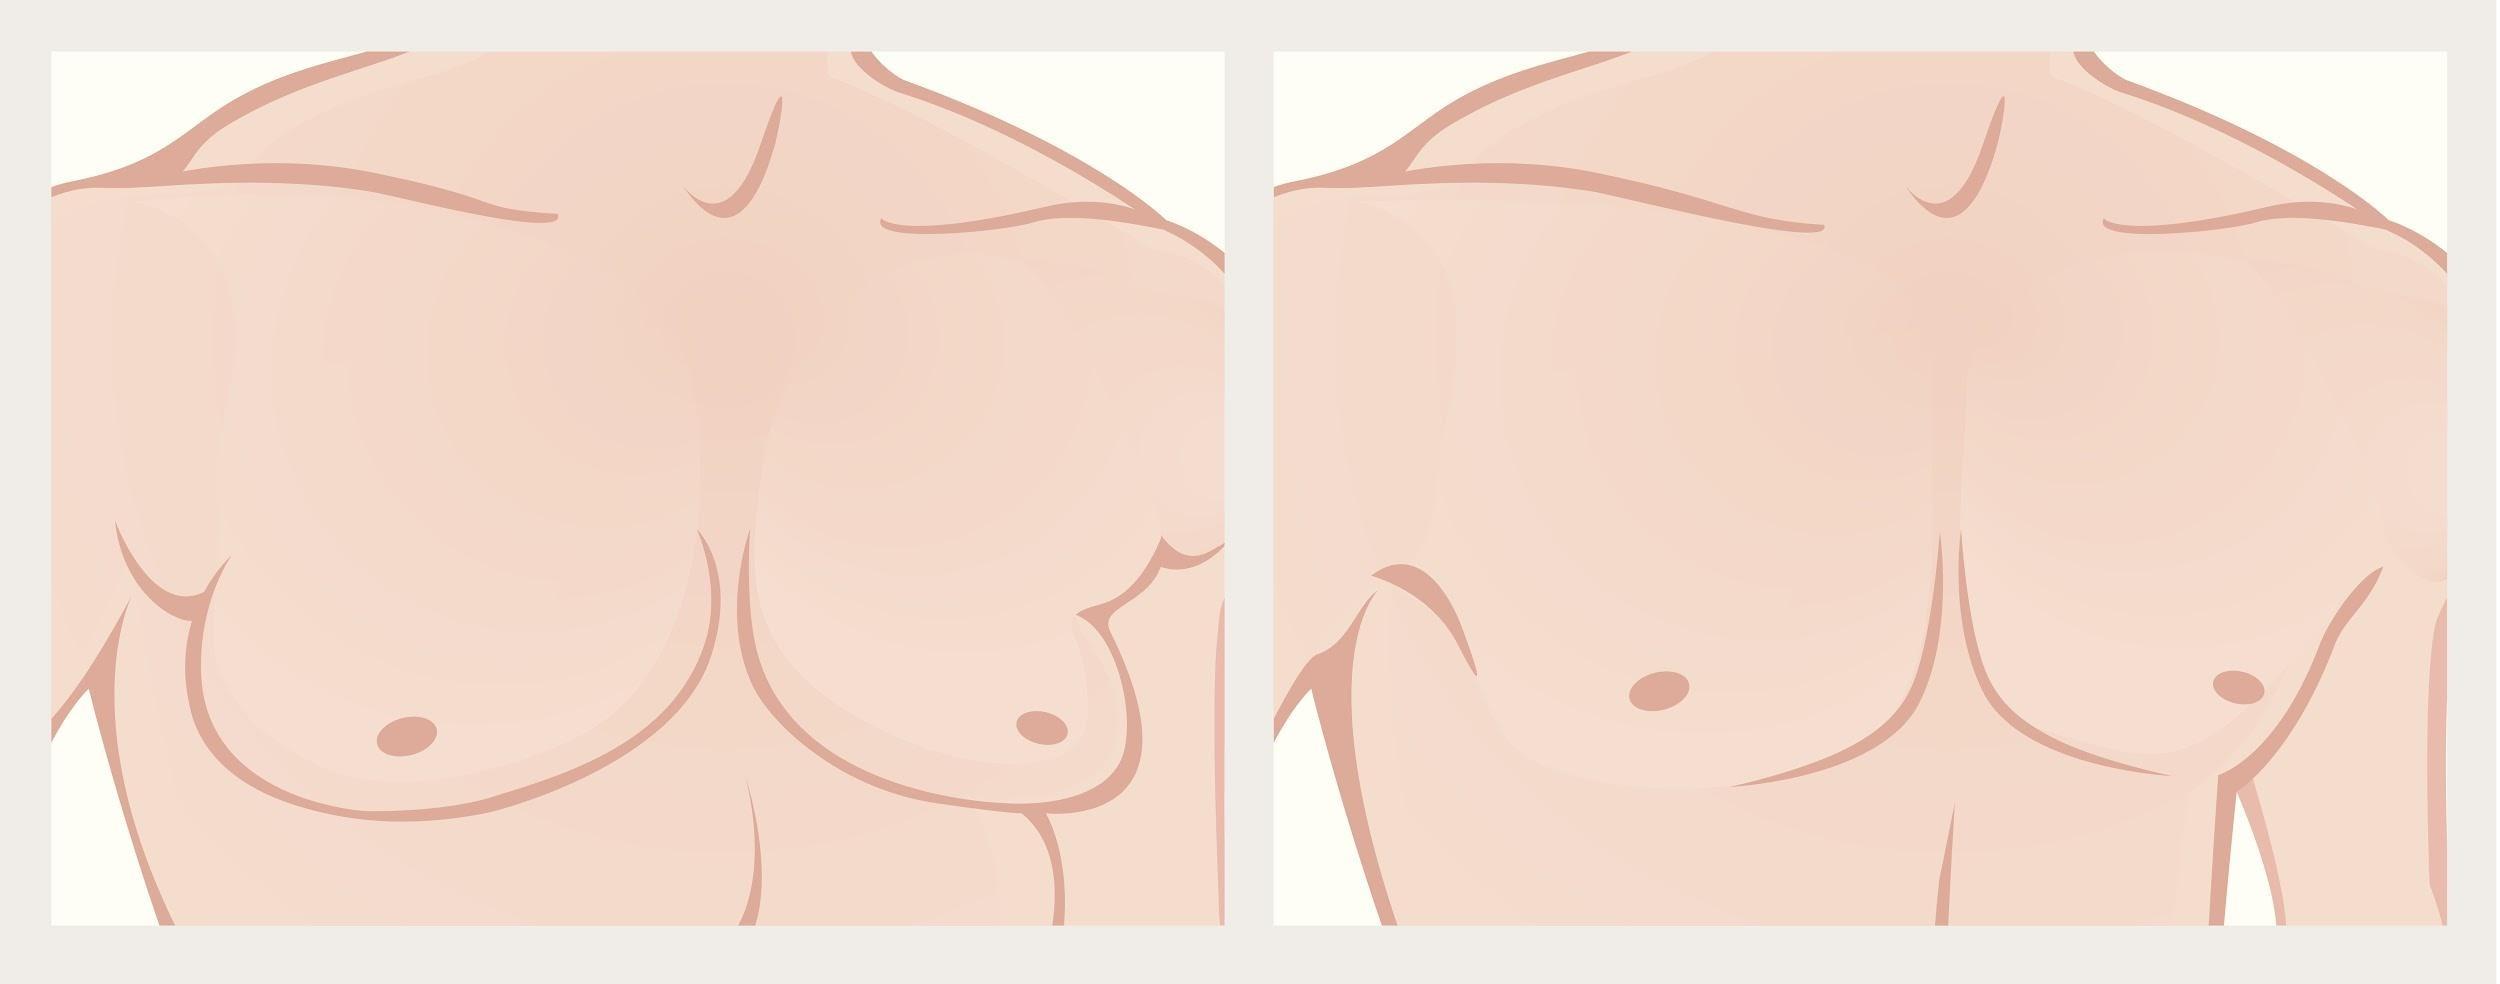 Gynecomastia in Northern Alabama and the Huntsville Area